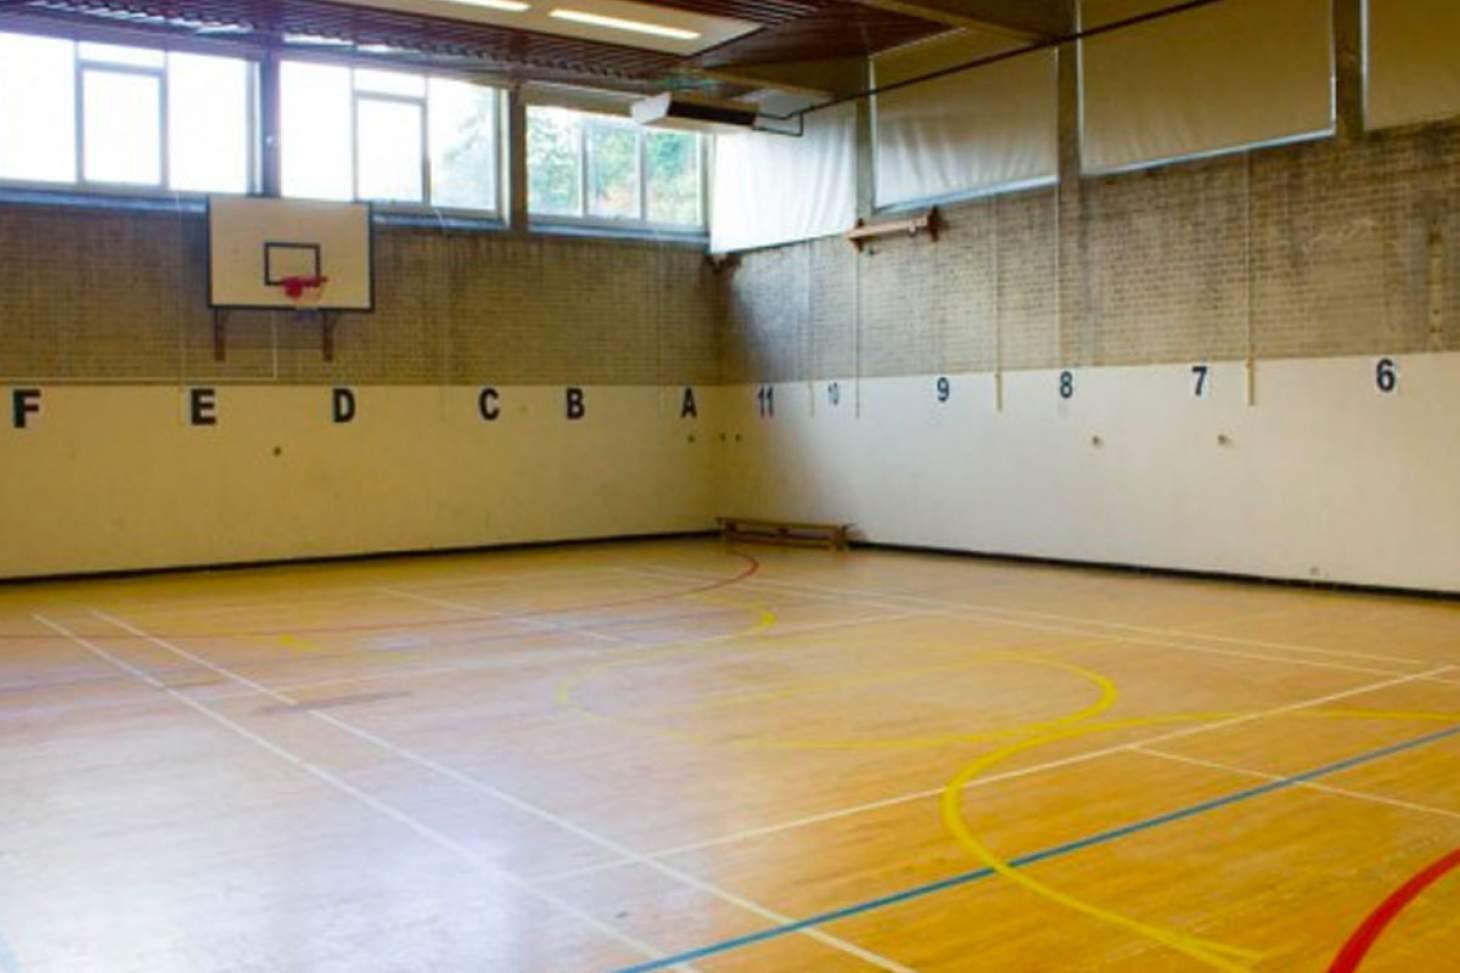 Harris Academy Battersea Court   Gymnasium badminton court